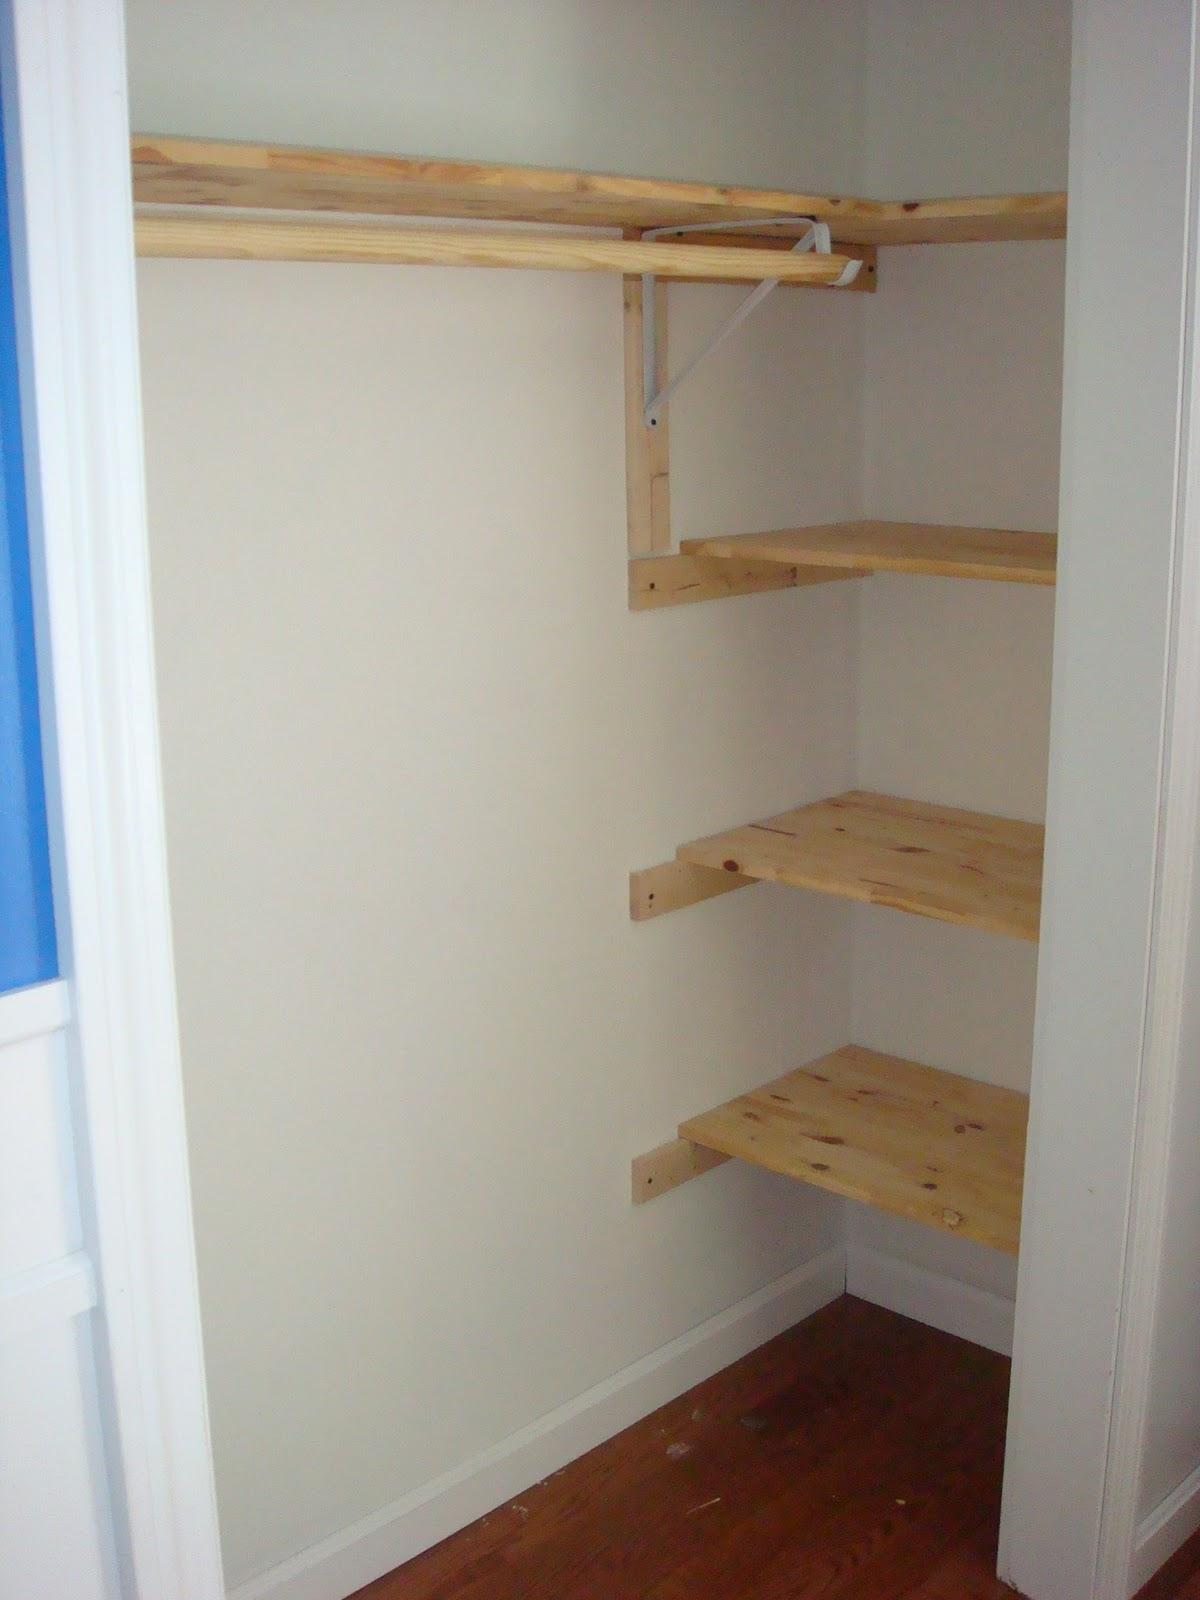 Clothes Closet: Closet Shelving With Clothes Rod